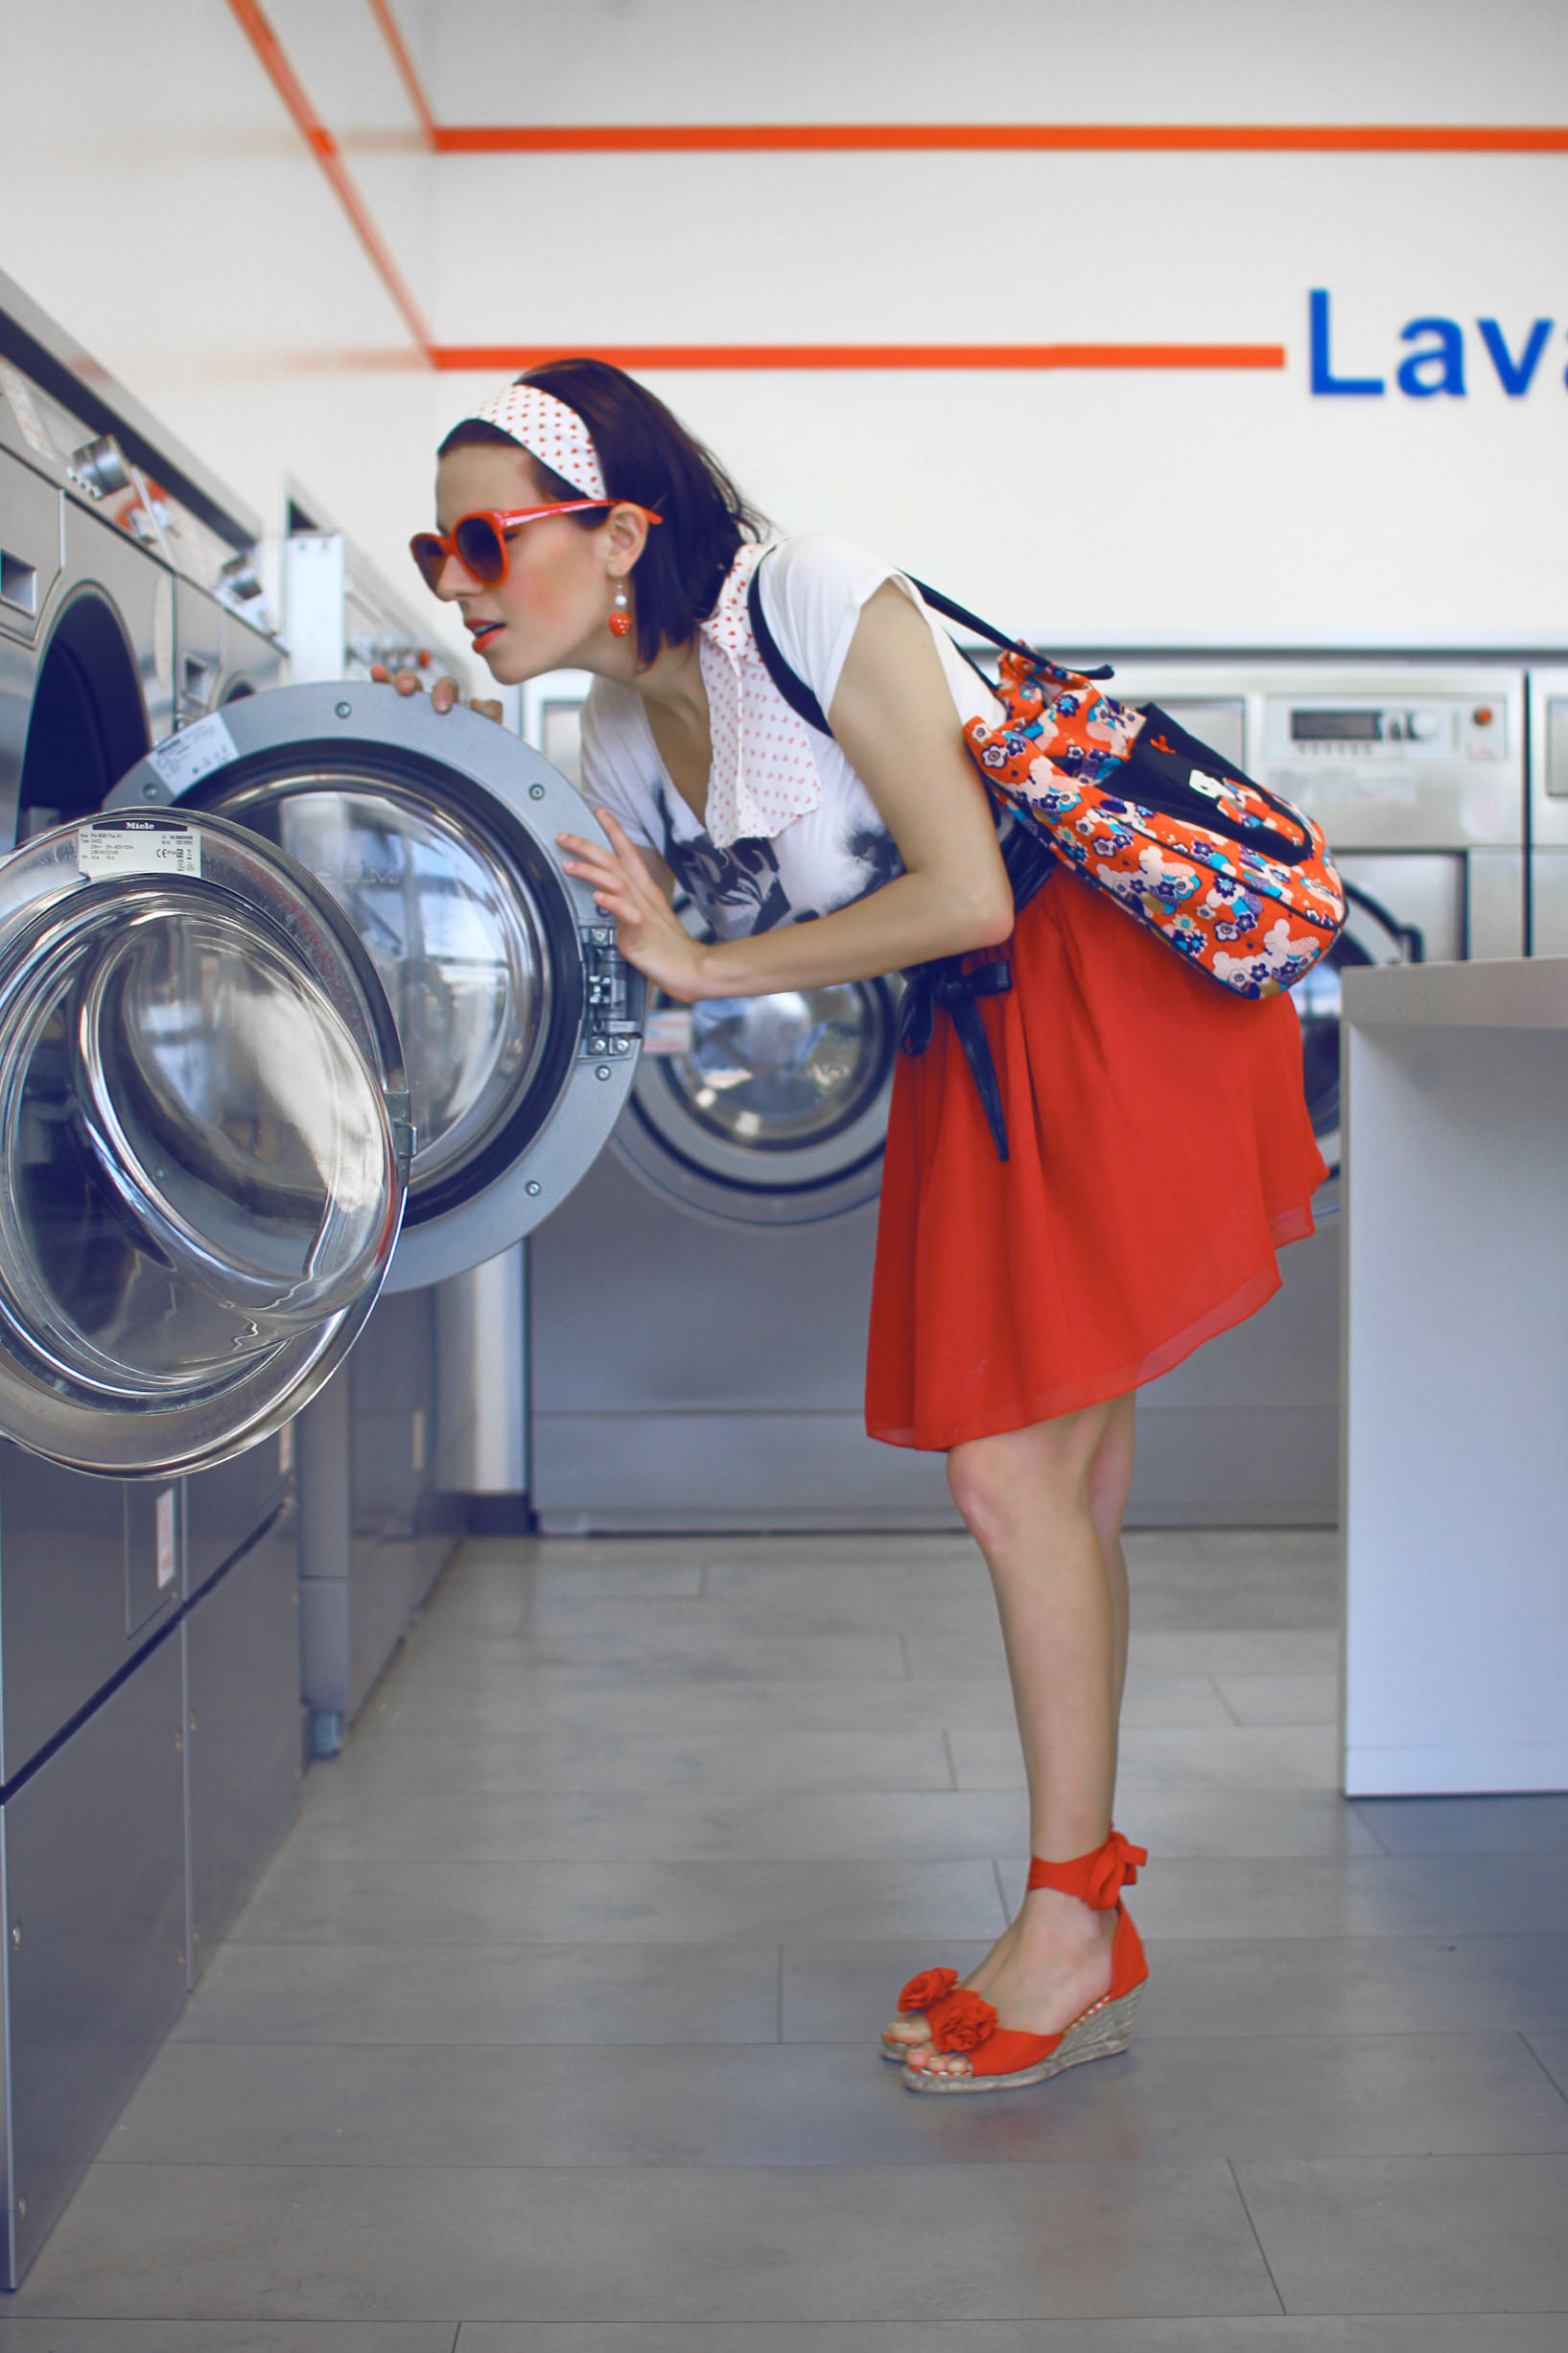 lavanderina-093-ok